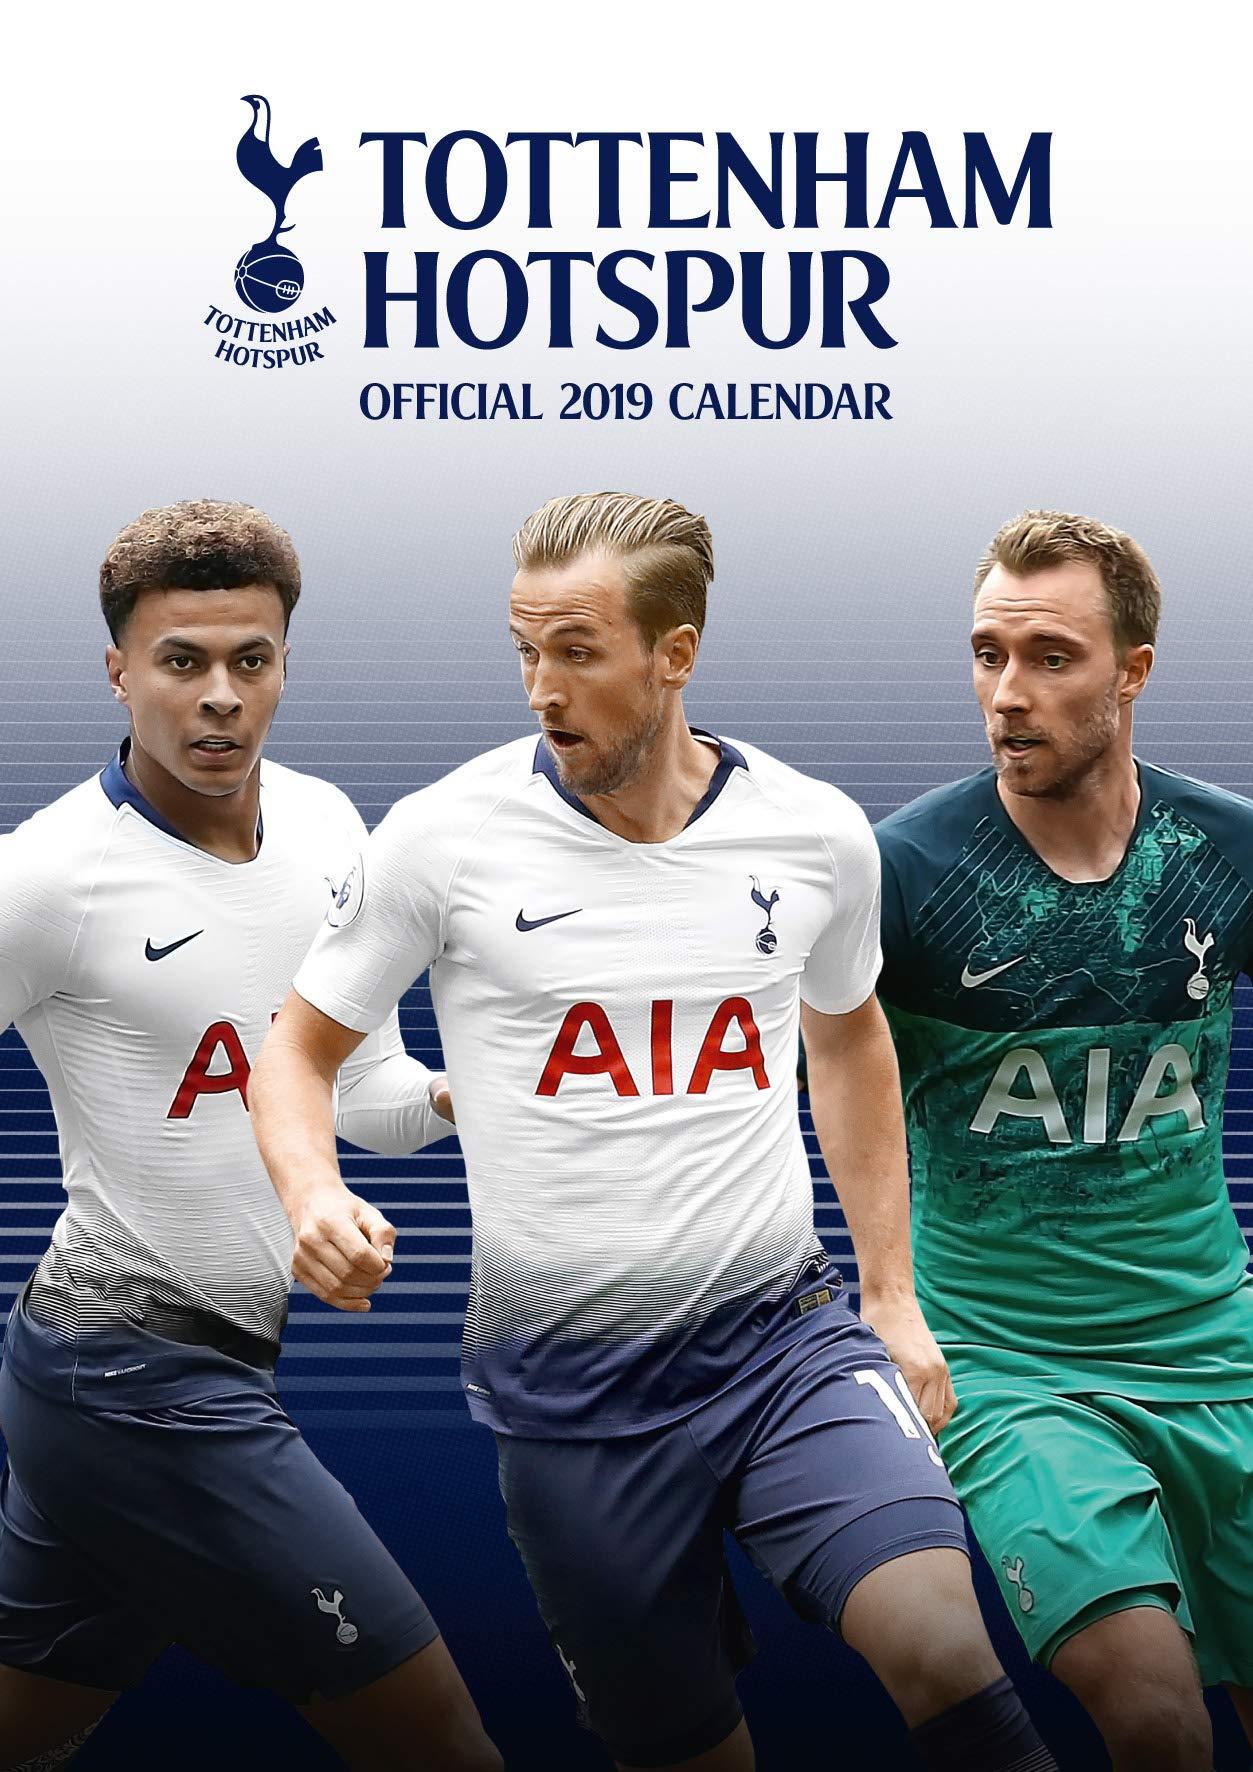 The Official Tottenham Hotspur F C Calendar 2019 Hotspur Tottenham 9781785497971 Amazon Com Books